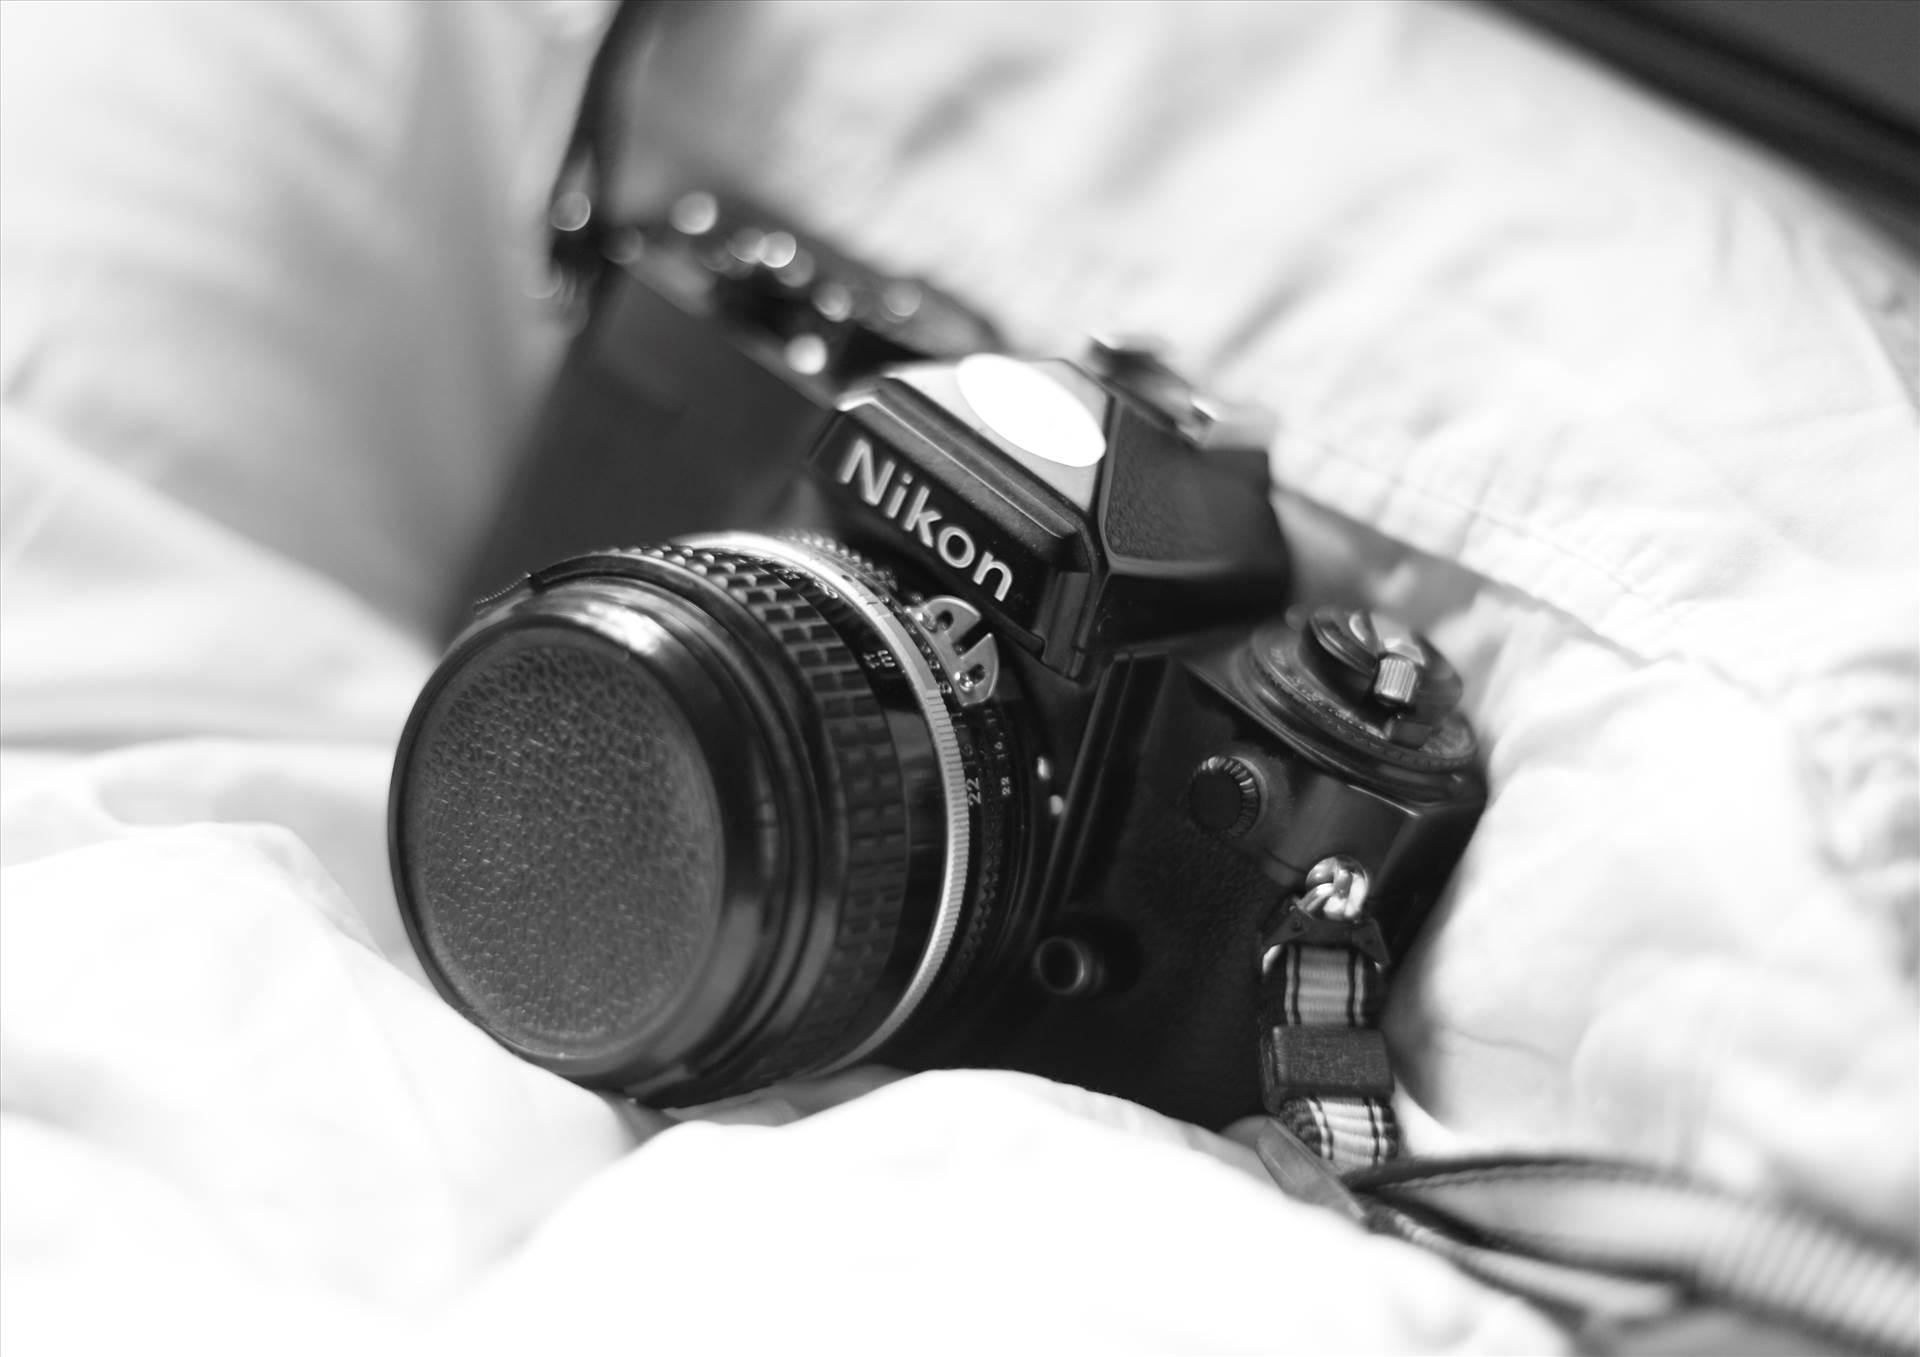 Film on Digital - An old Nikon SLR, captured by a modern digital camera. by D Scott Smith